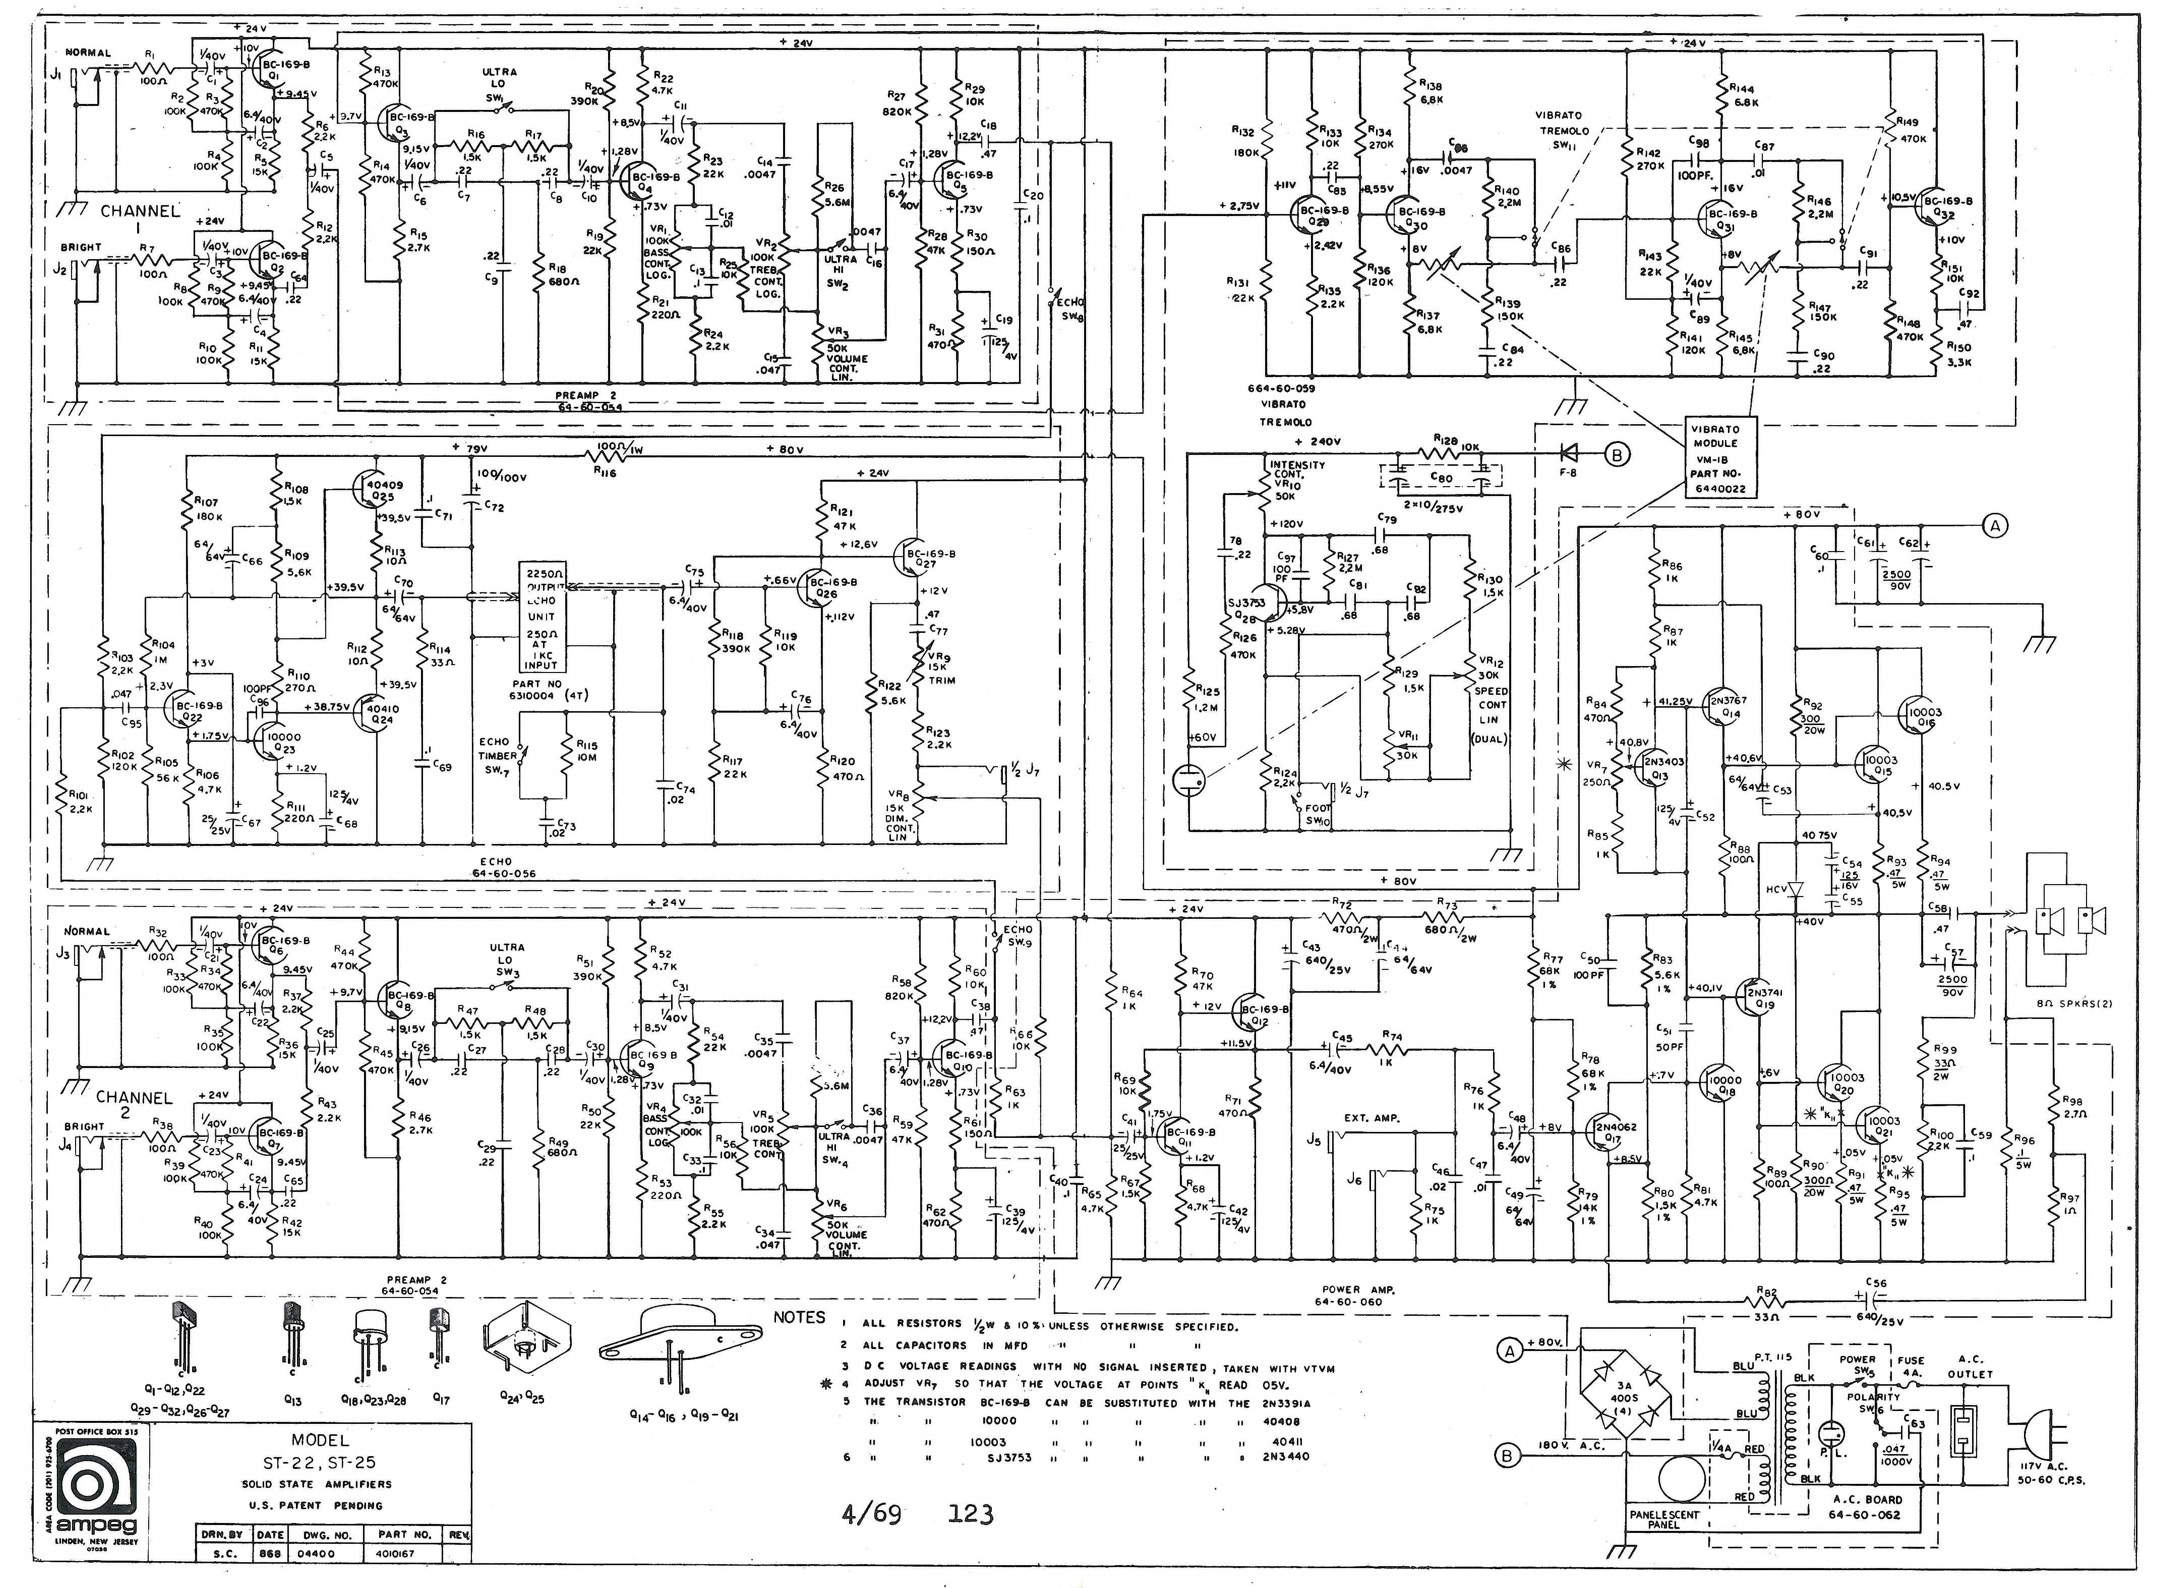 Vintage Ampeg Docs Amplifier Schematics Sst Sbt Power